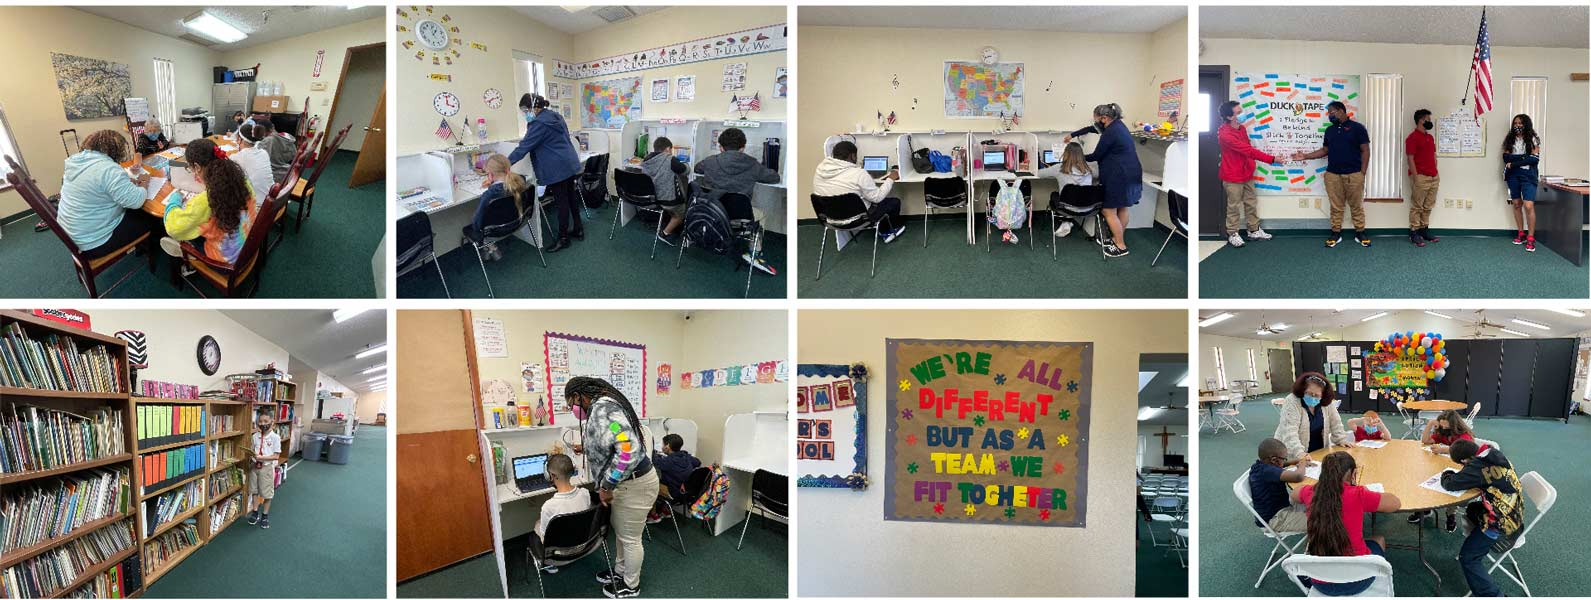 Esther's School - Haines City Campus